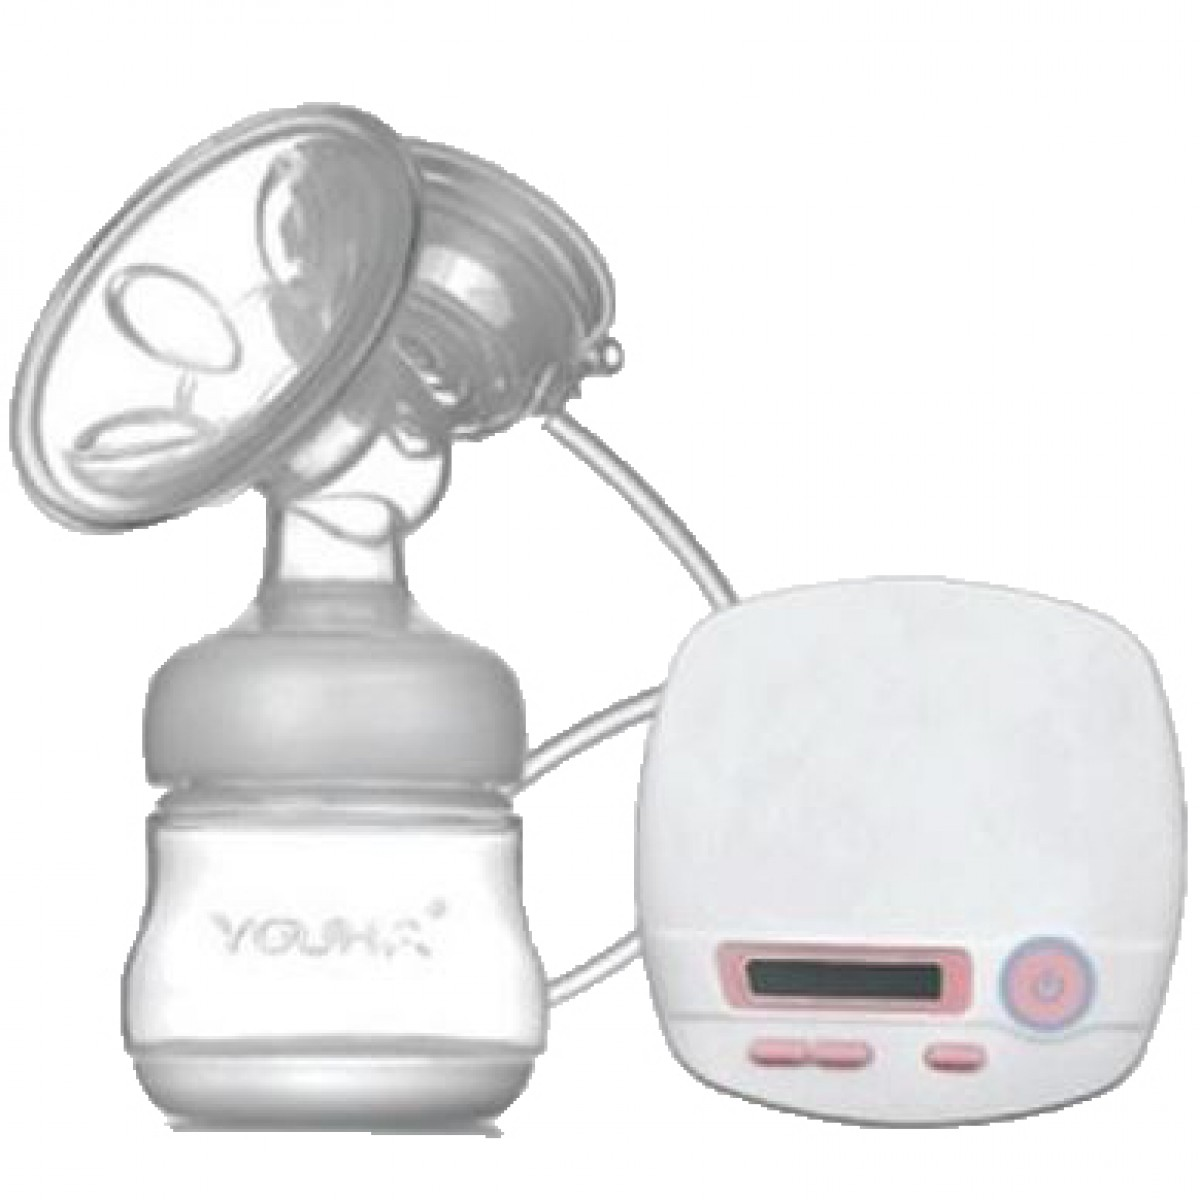 Youha Cherryx Single Electric Breast Pump - Kico Baby Center